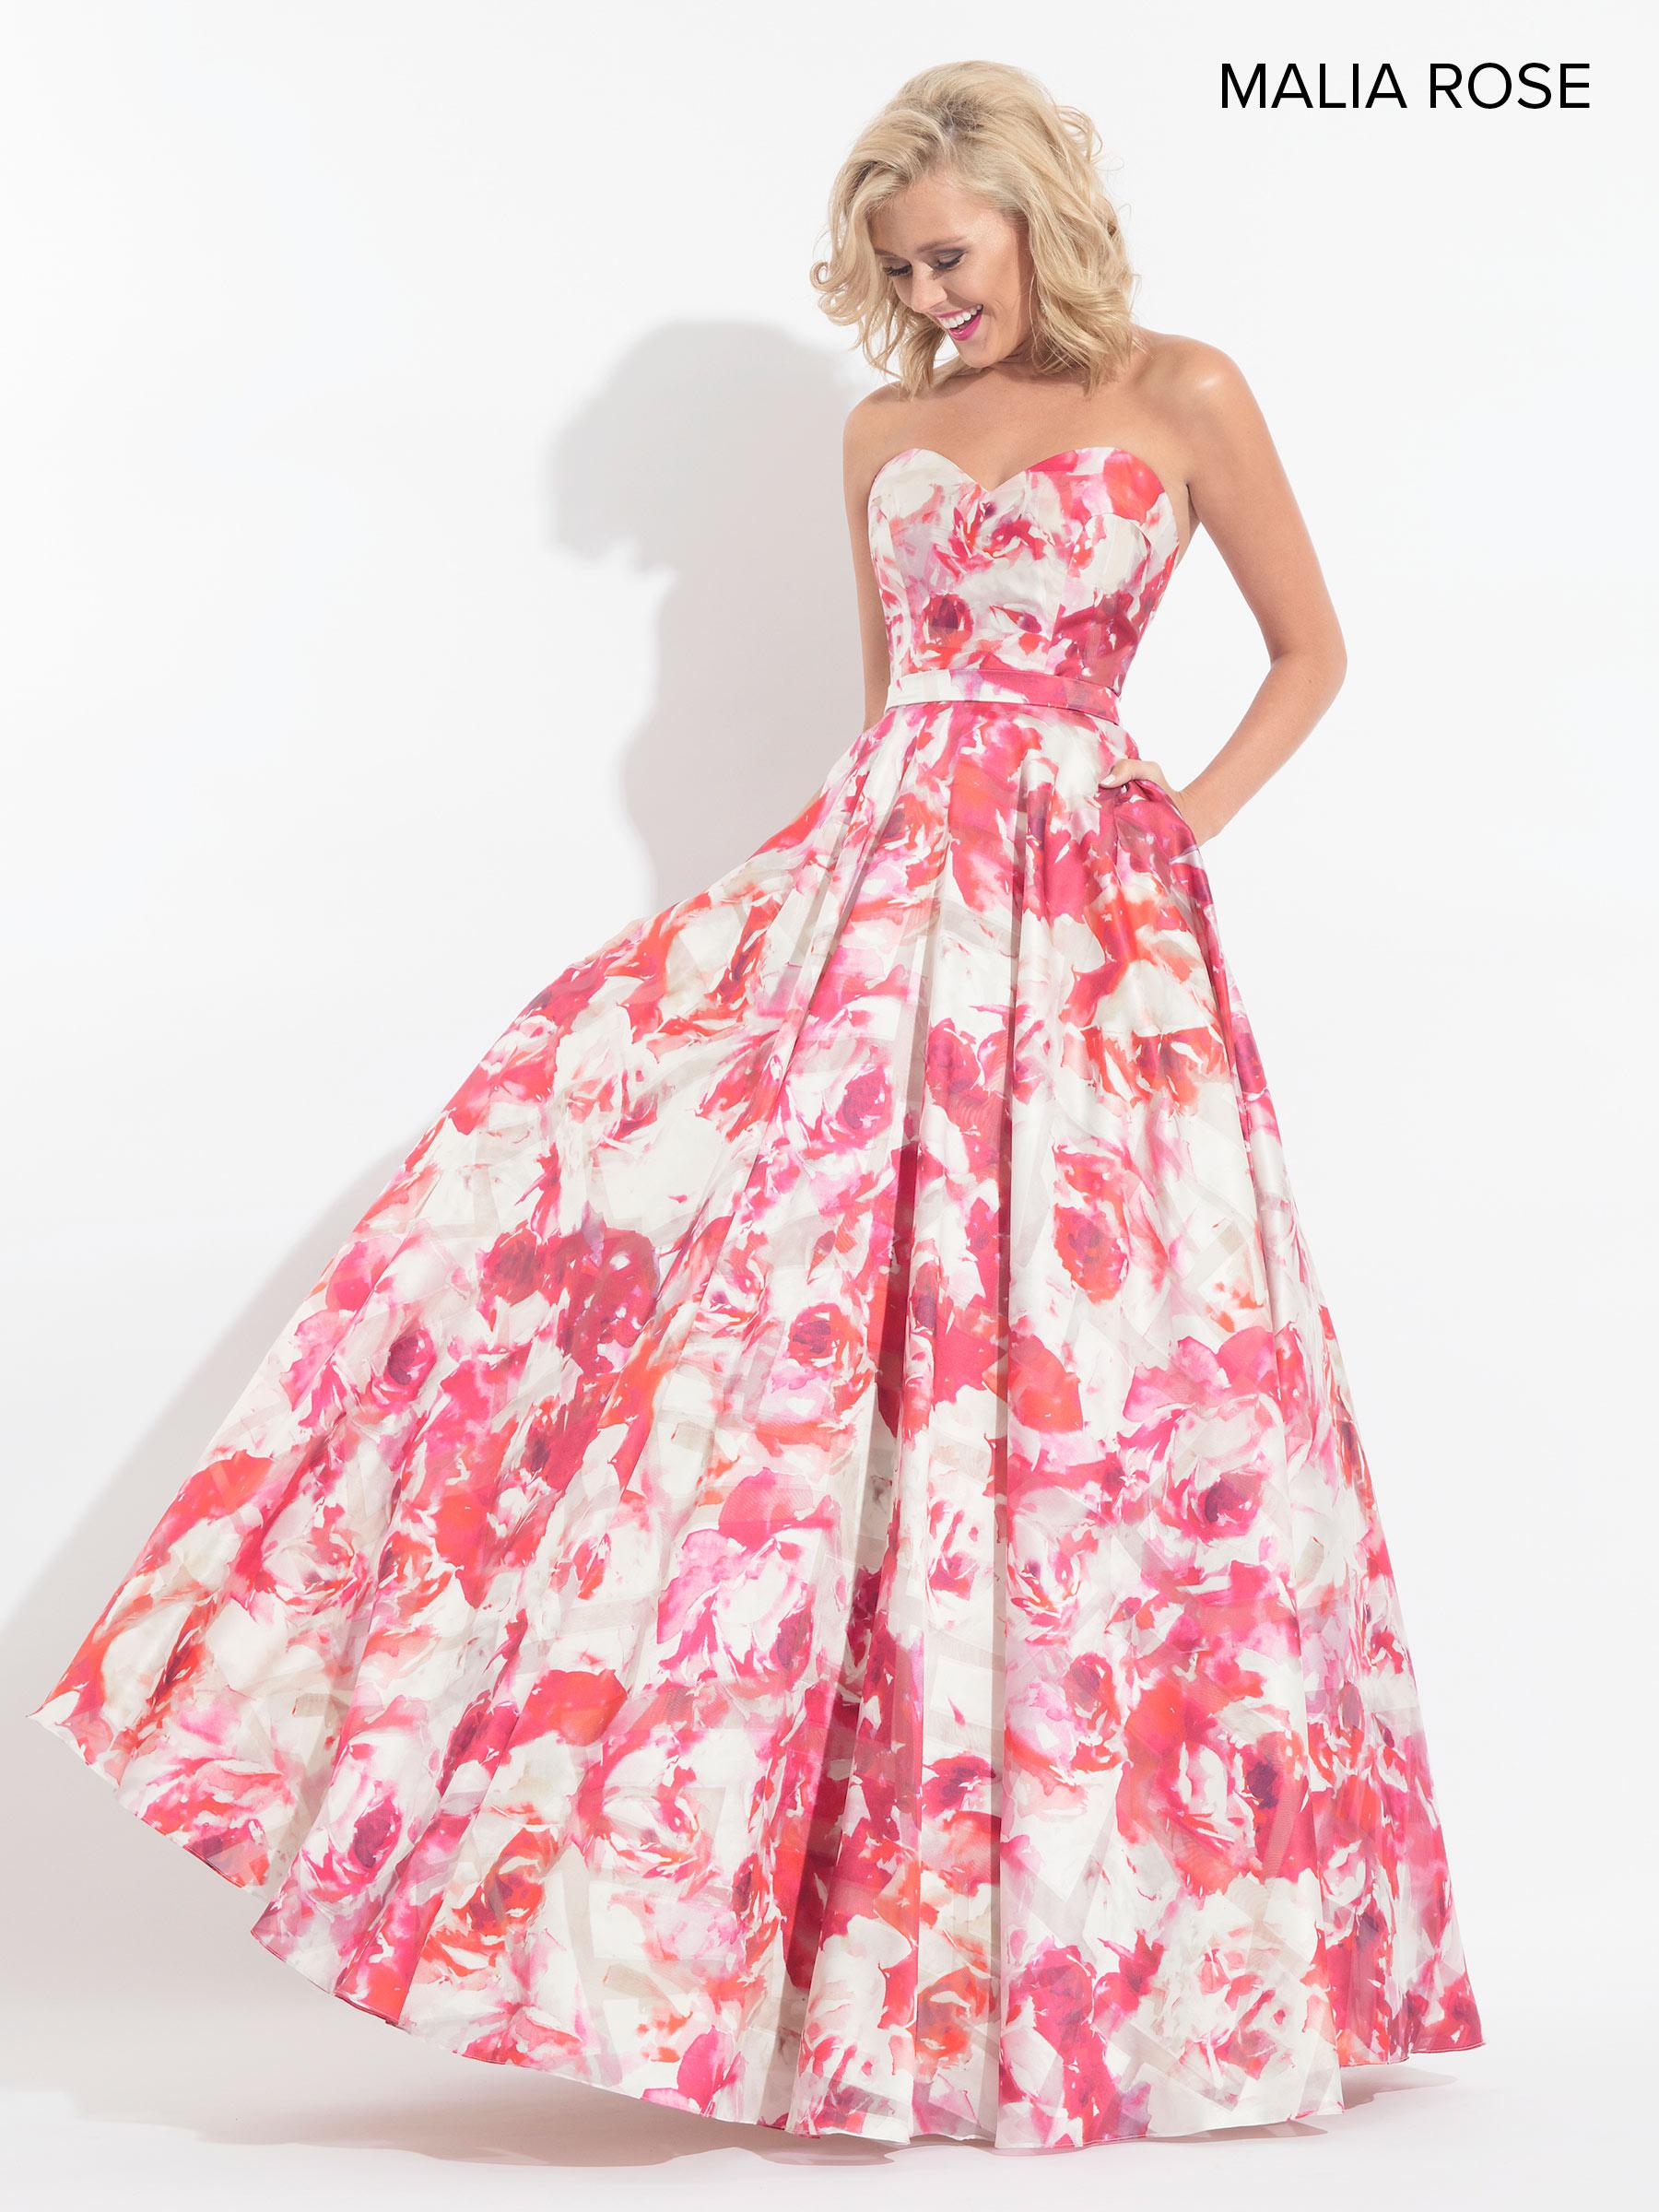 Malia Rose Prom Dresses | Style - MP1024 in Fuchsia or ...